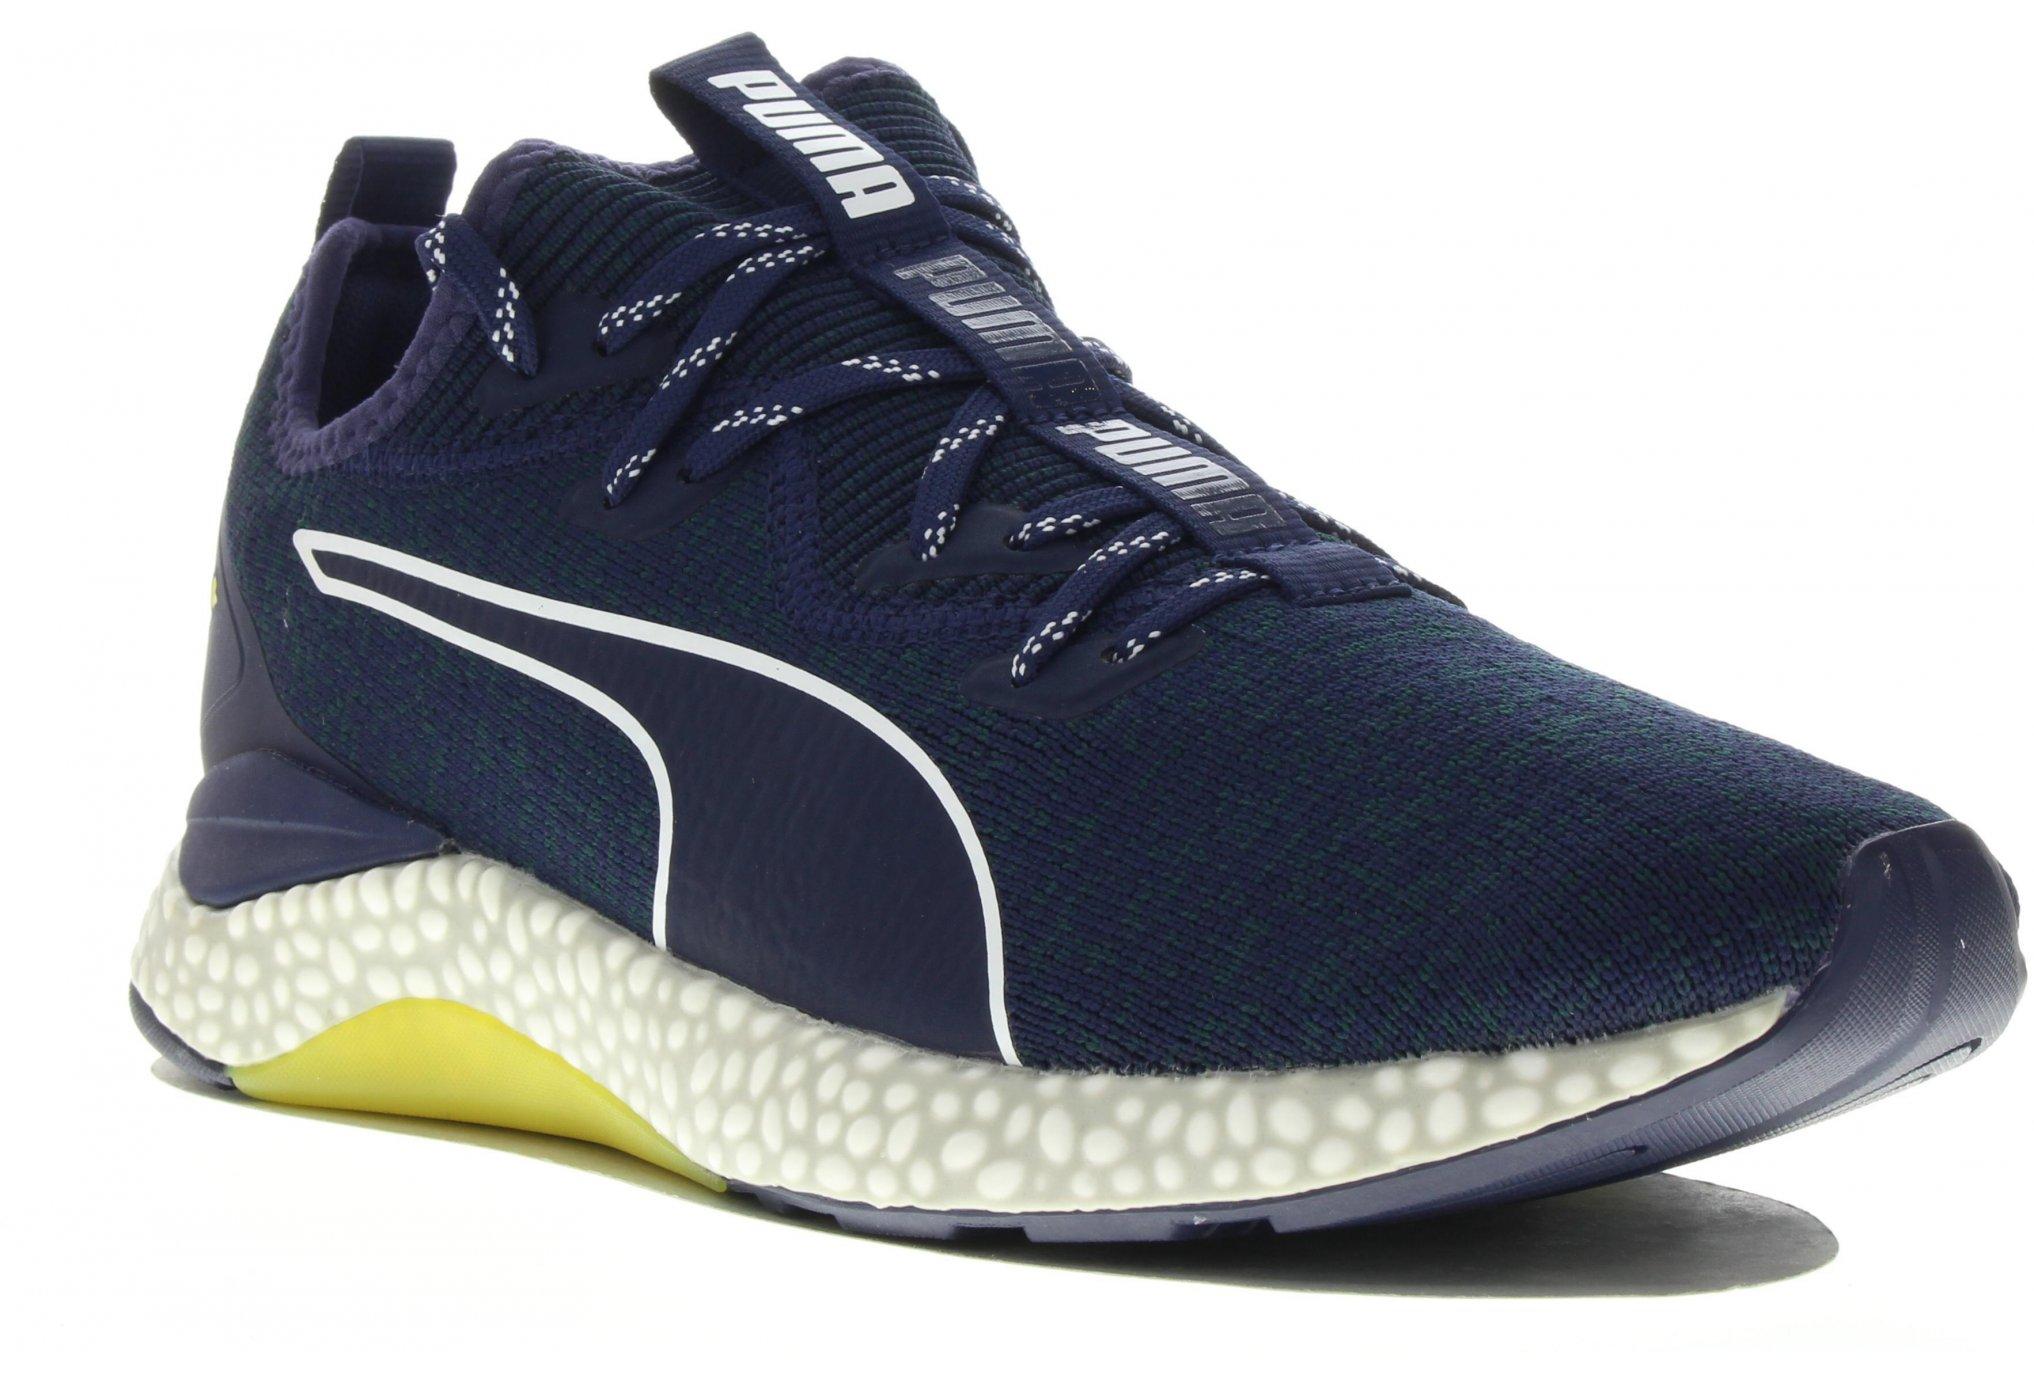 Puma Hybrid Runner M Diététique Chaussures homme